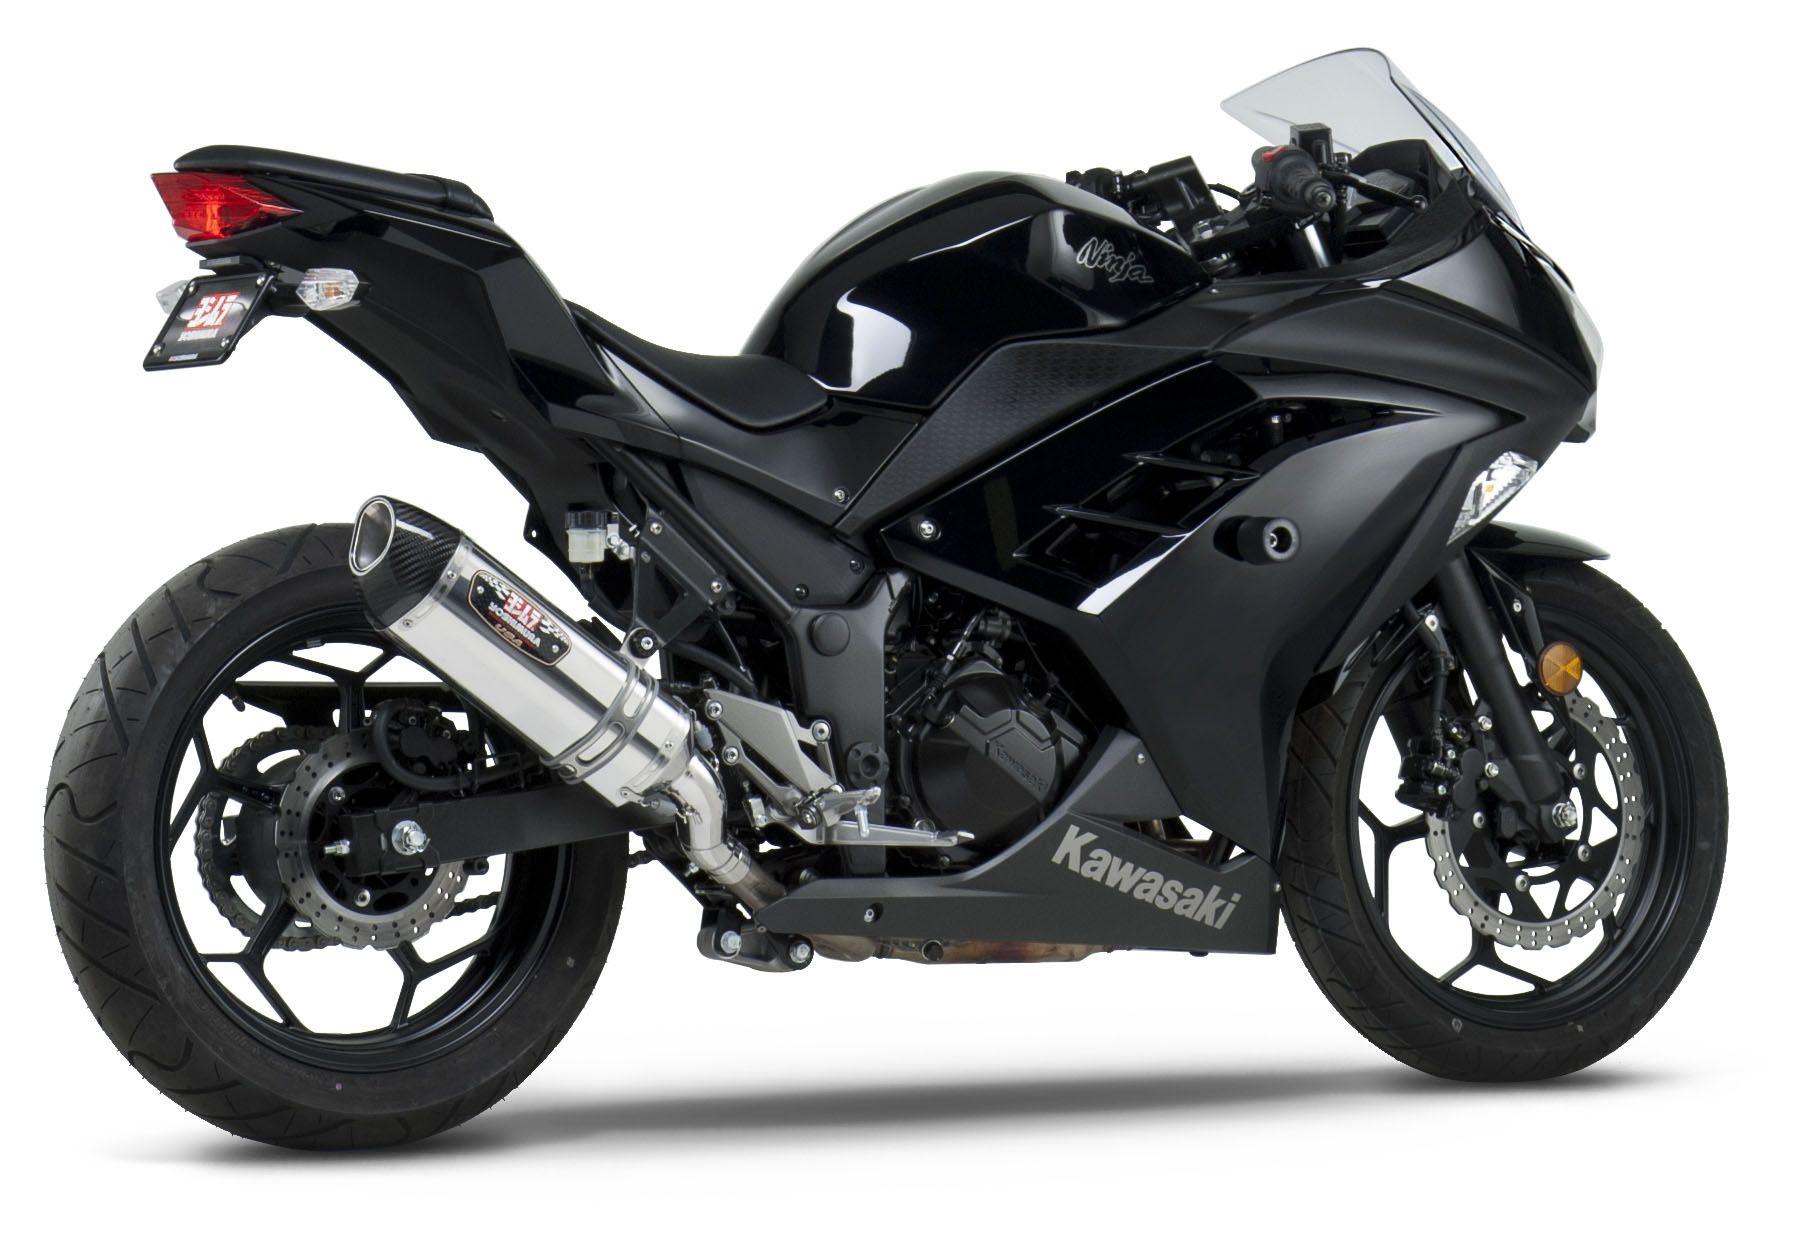 kawasaki ninja 300 loud exhaust bike gallery. Black Bedroom Furniture Sets. Home Design Ideas